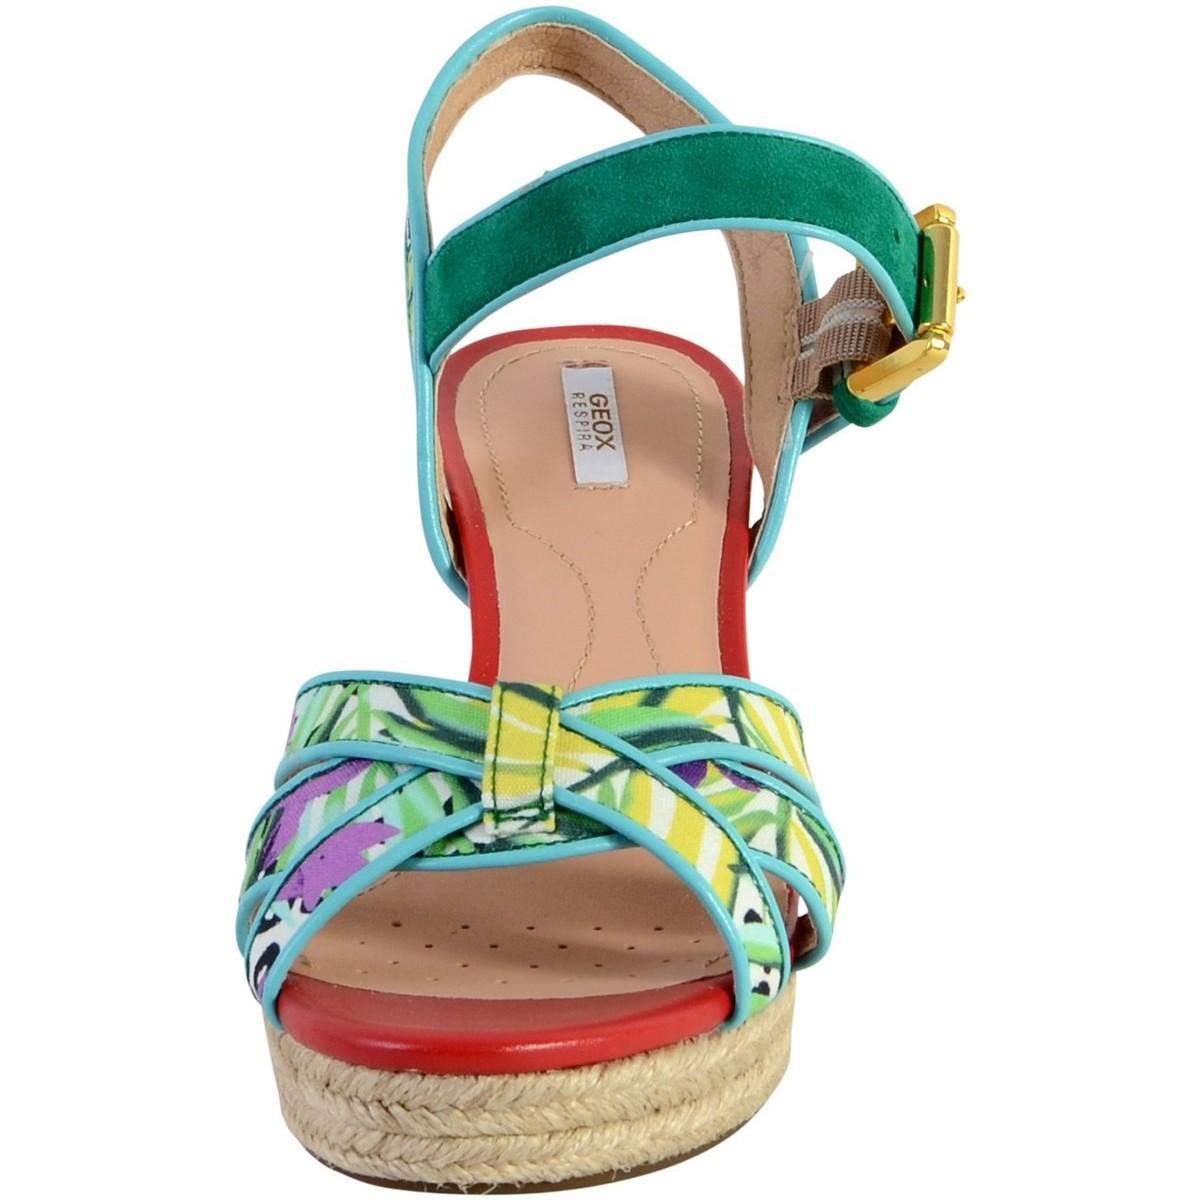 Sandale Suede Sandales Soleil A D Geox Femmes En Goat Multicolor TFJ3ucKl15